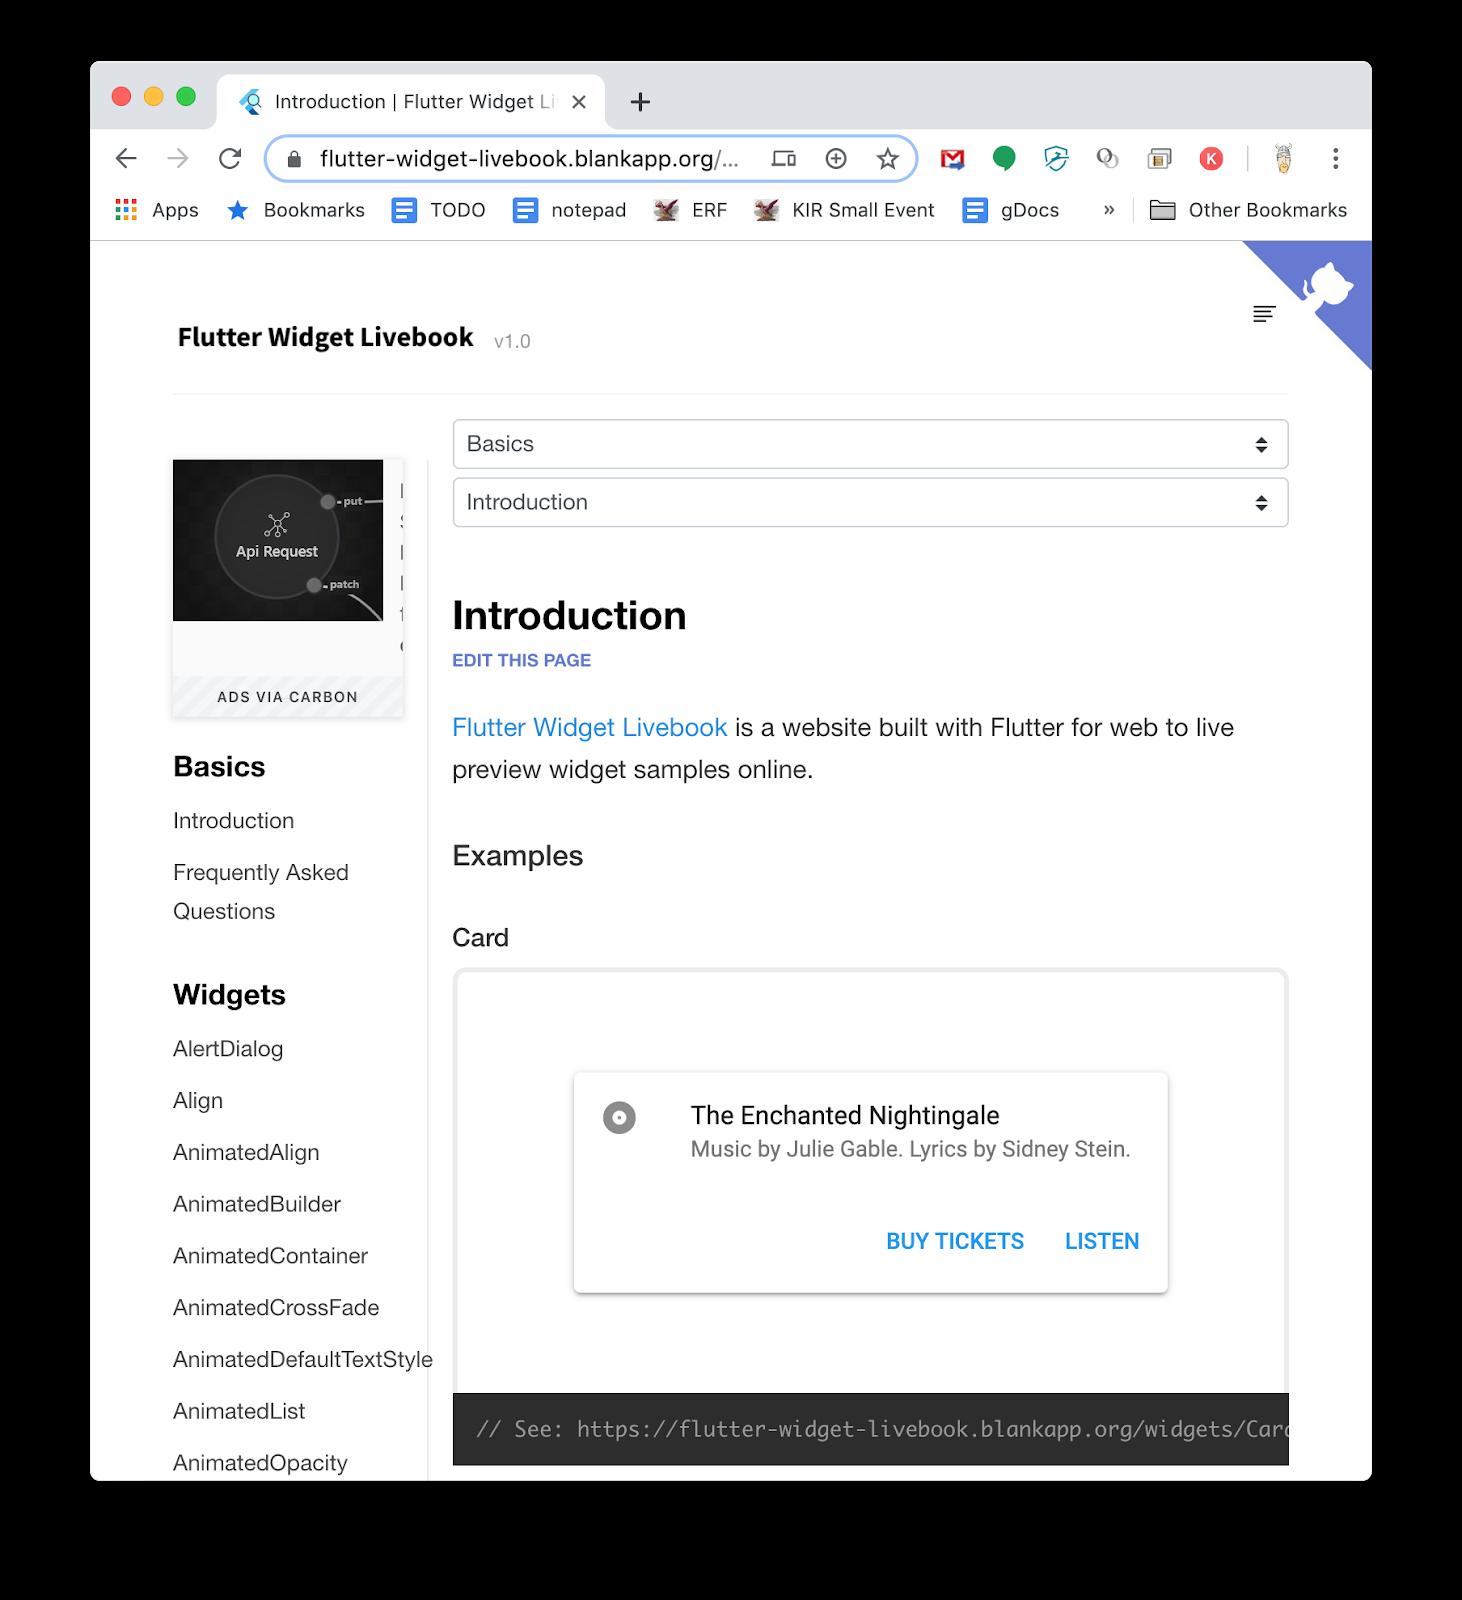 Flutter Widget Livebook